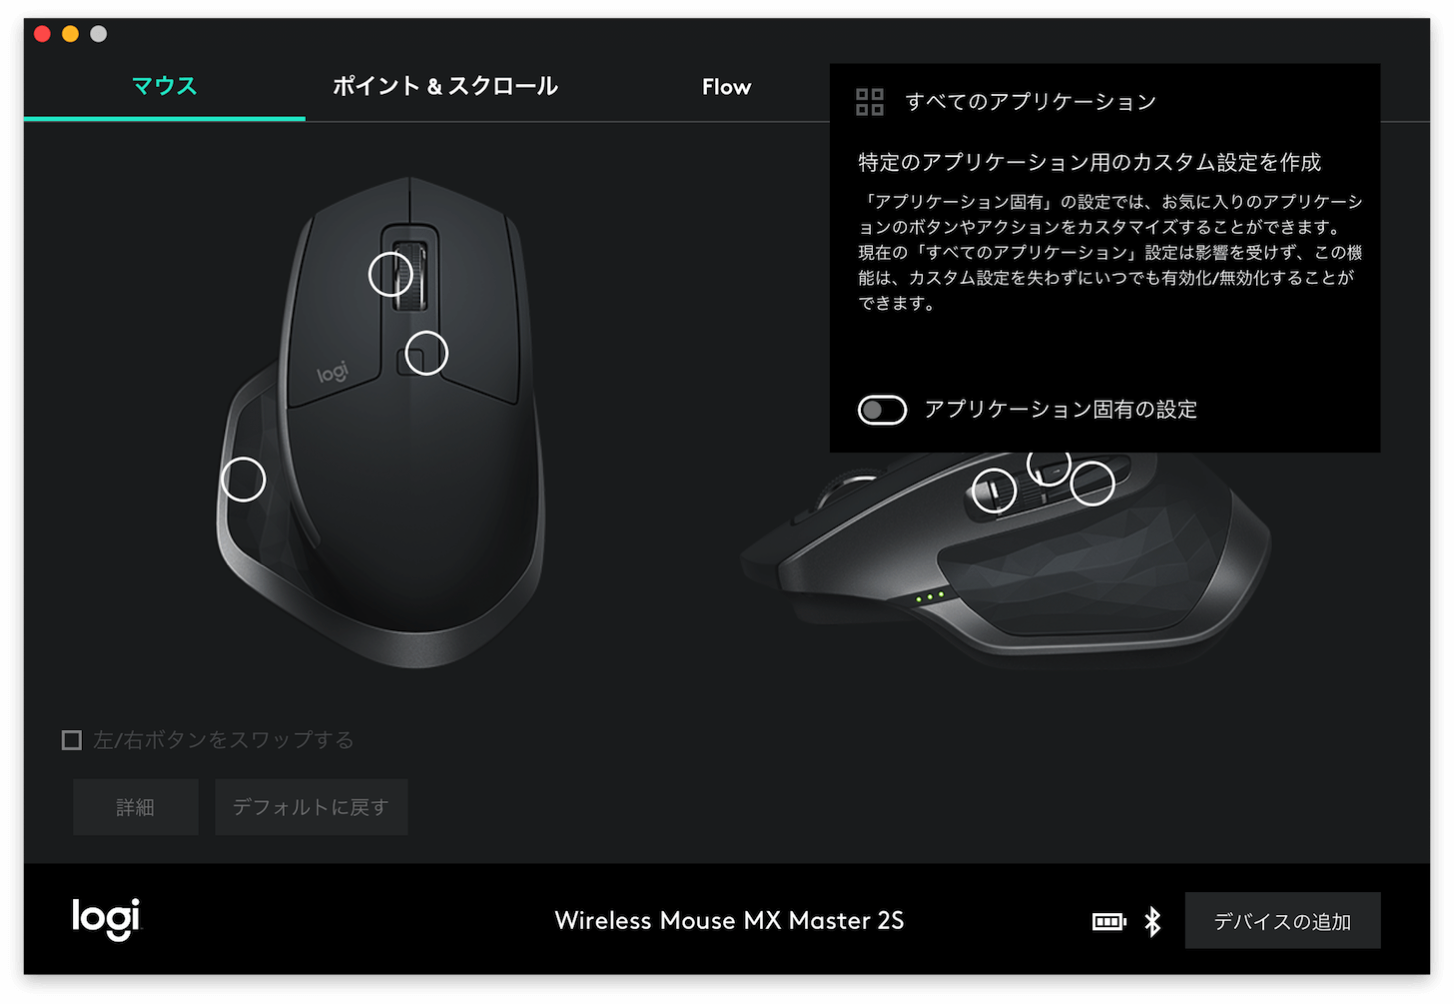 MX Master 2S setting 16